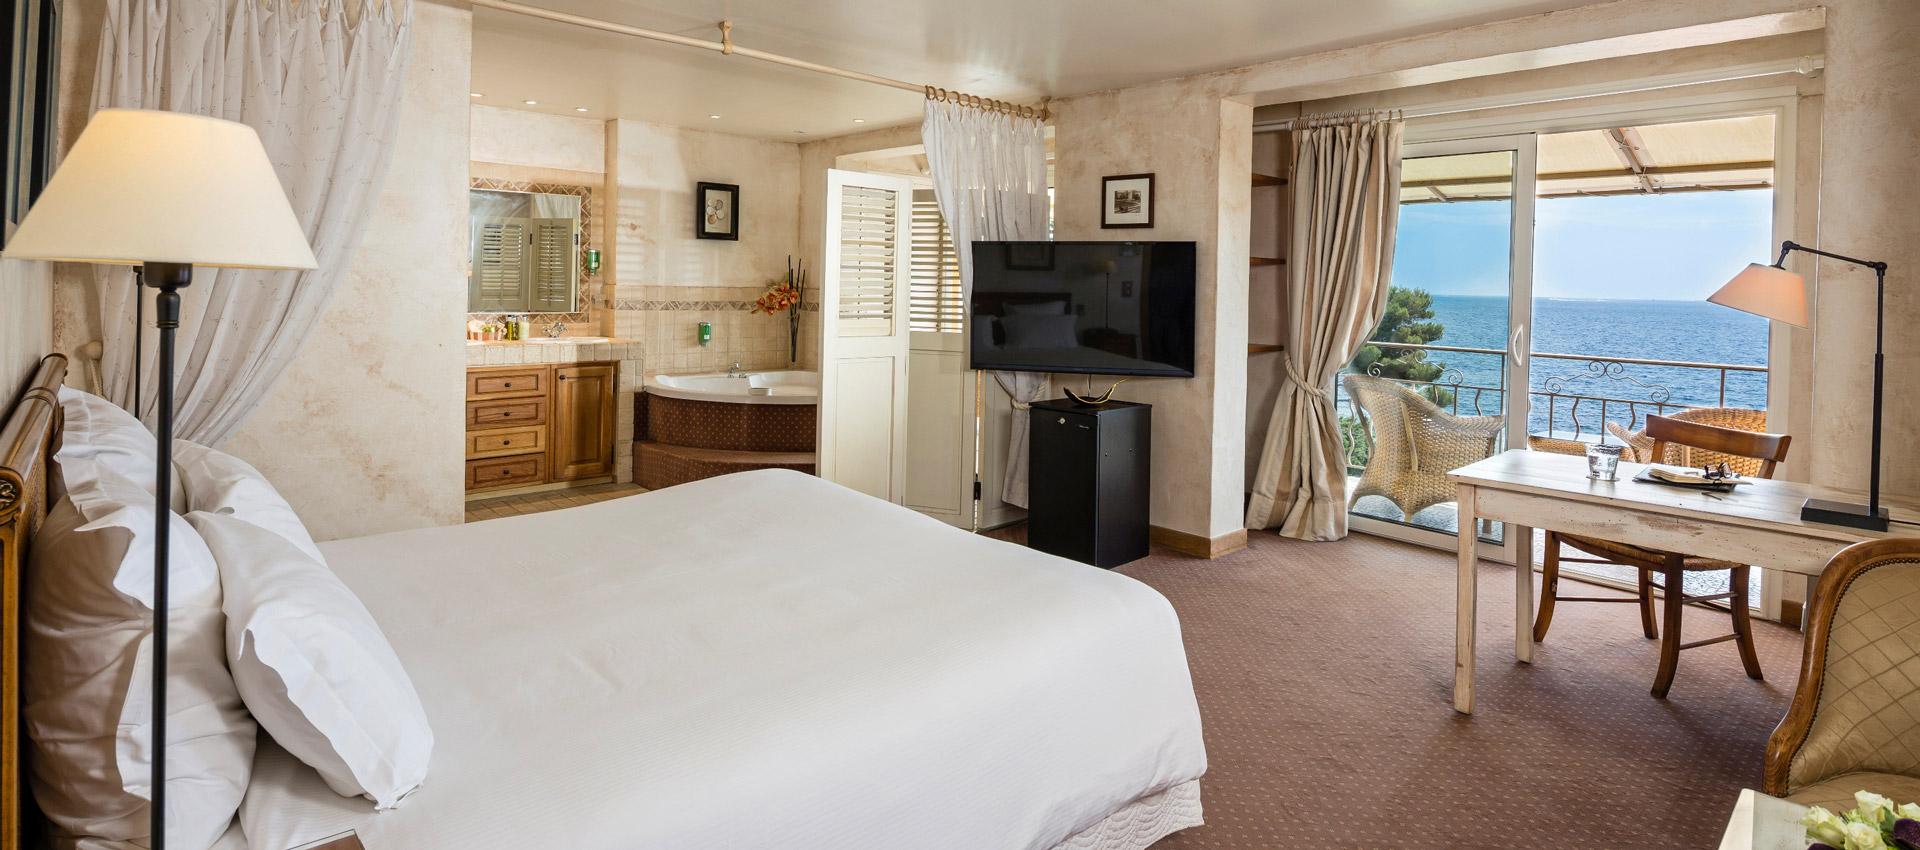 Hôtel Best Western Plus Montfleuri 4